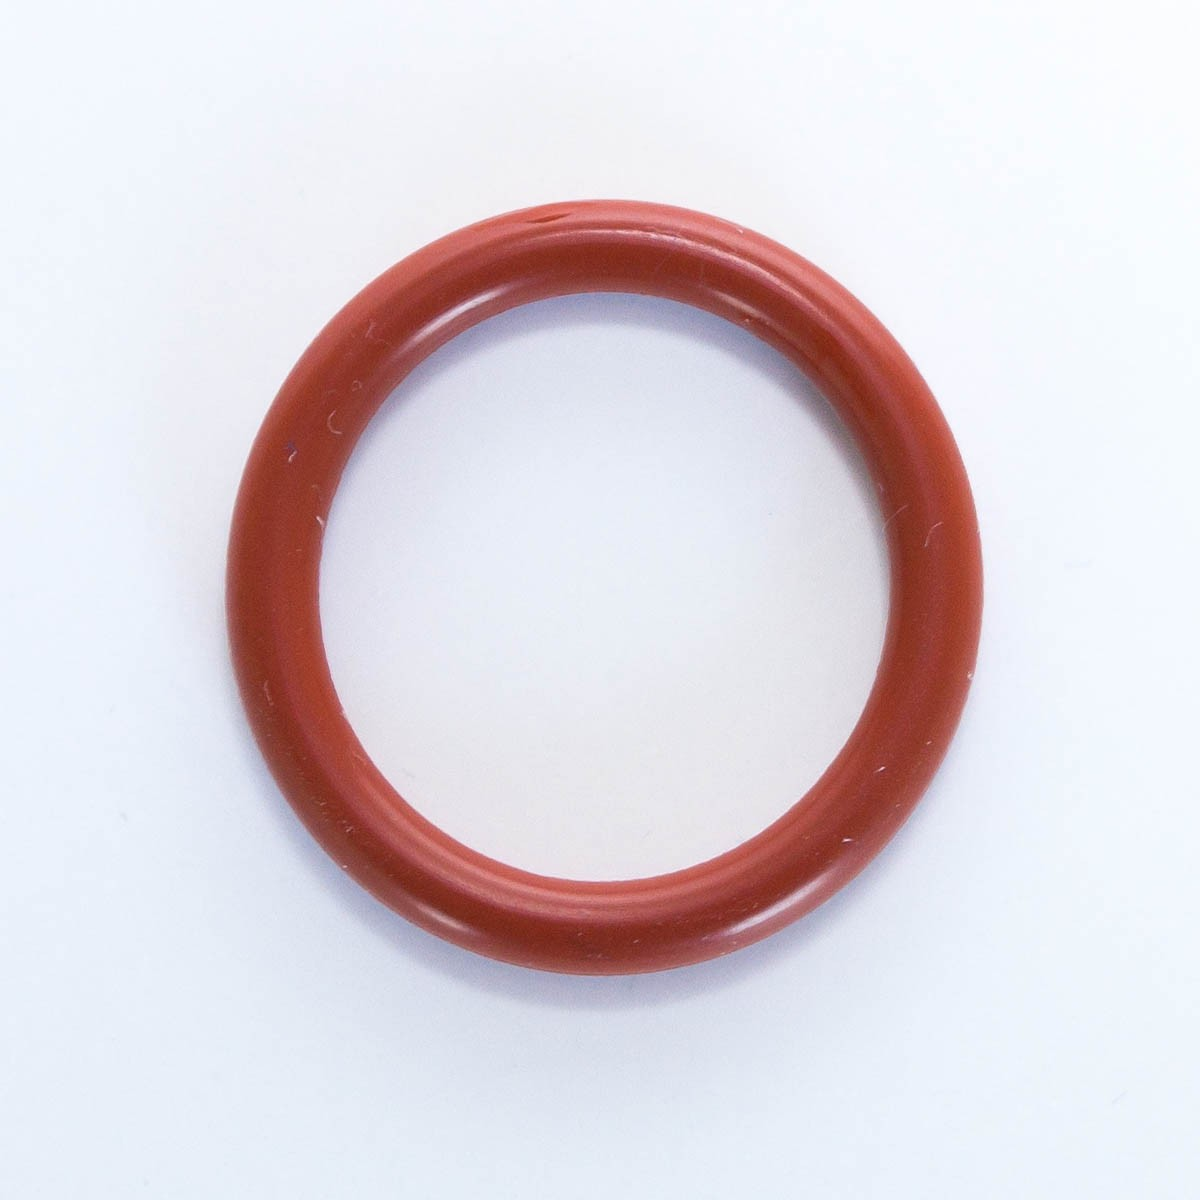 "212 Silicone O-ring (7/8"" ID, 1-1/8"" OD)"